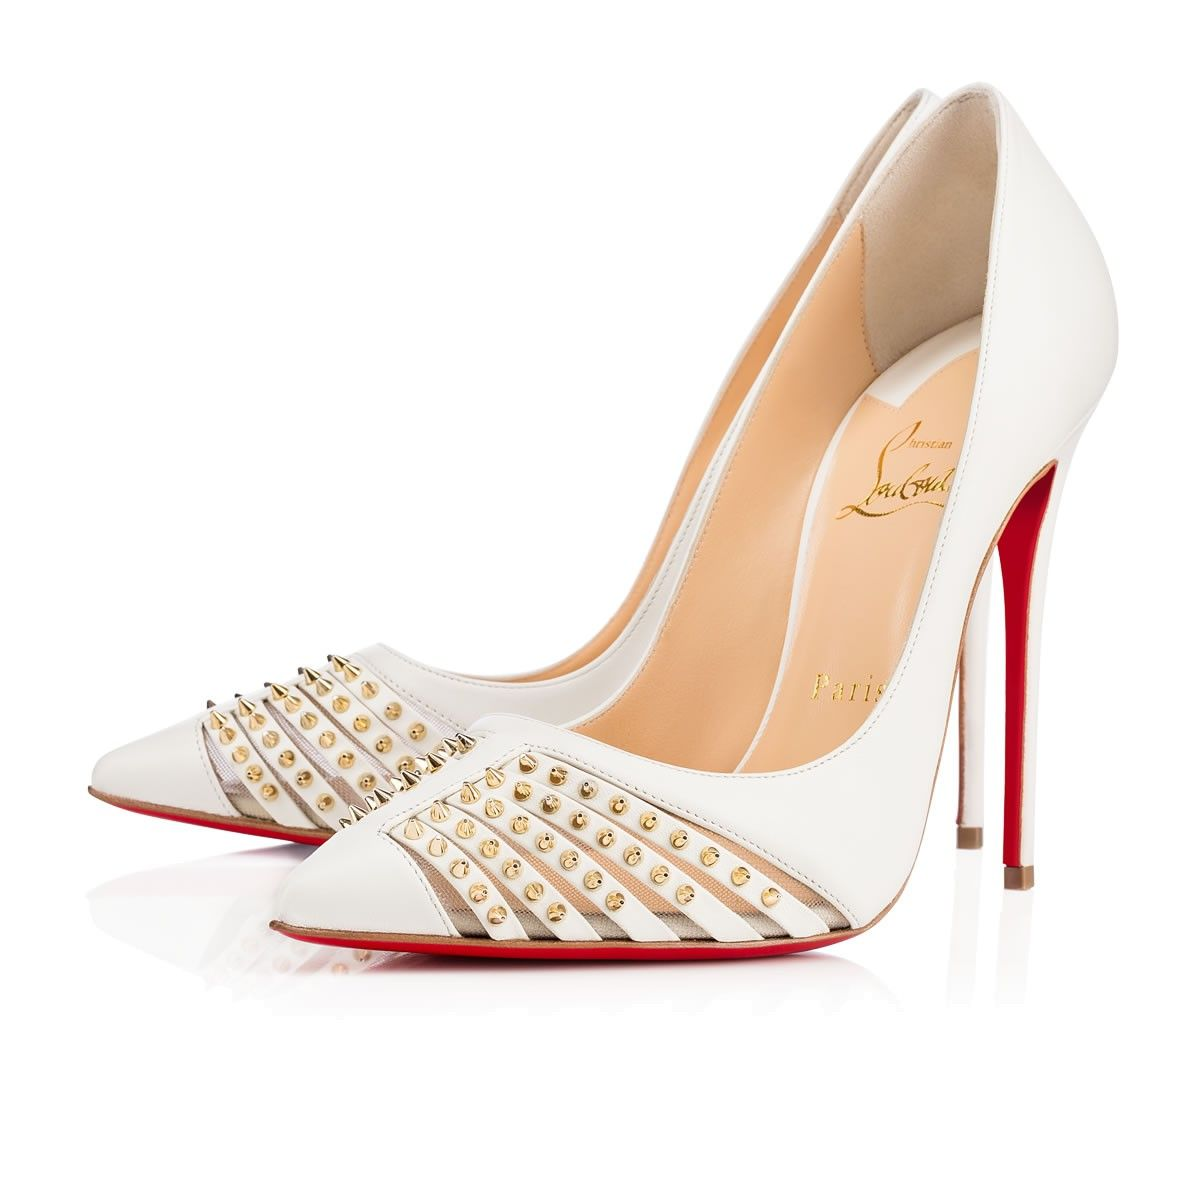 603ca4172351 Bareta kid 120 NEIGE LIGHT GOLD Kid - Women Shoes - Christian Louboutin